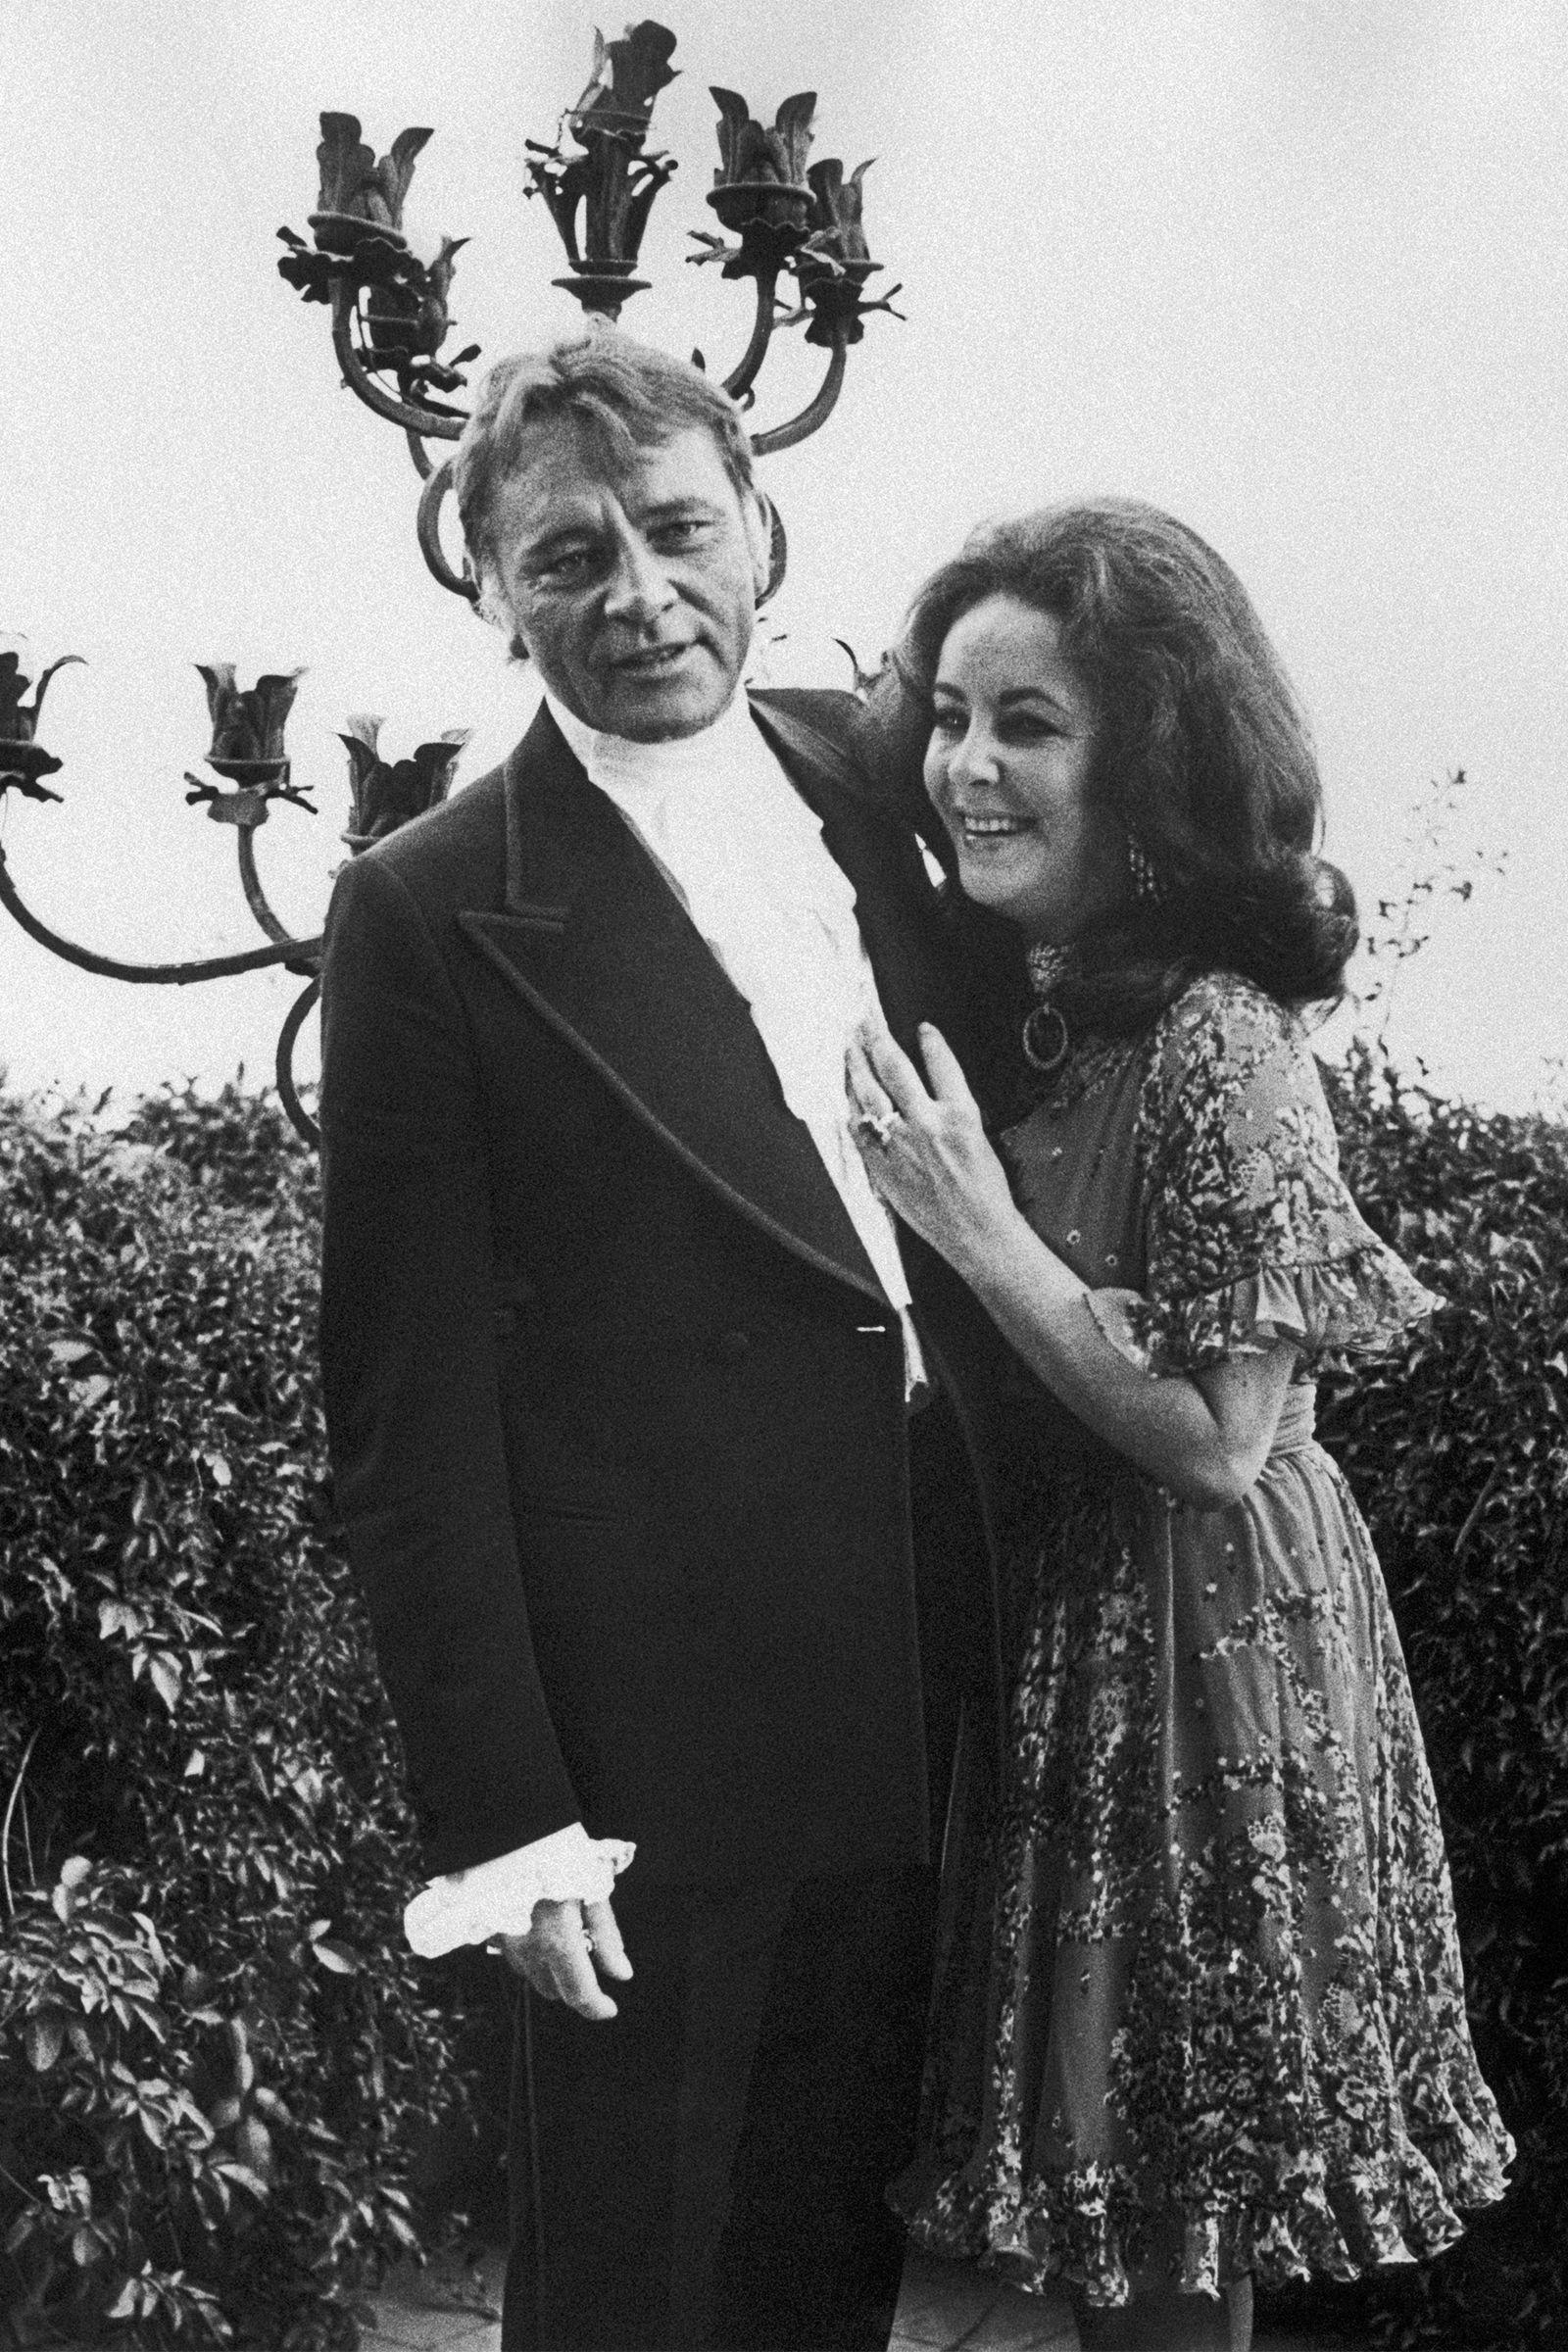 Liz taylor and richard burton relationship